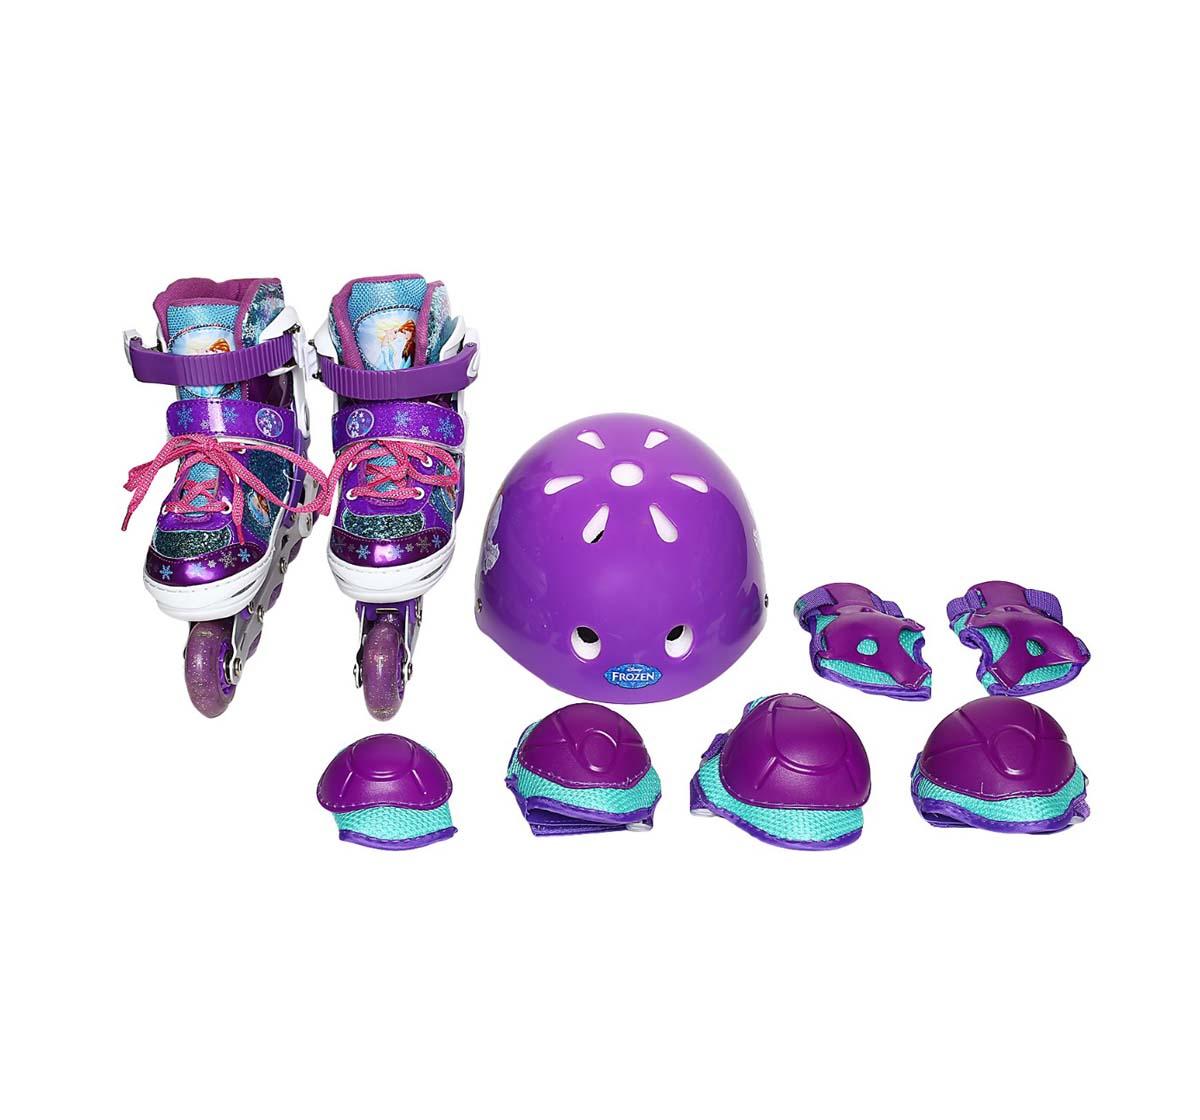 Disney | Disney Red Frozen Inline Skate Combo Set Skates and Skateboards for Kids age 8Y+ (Red)